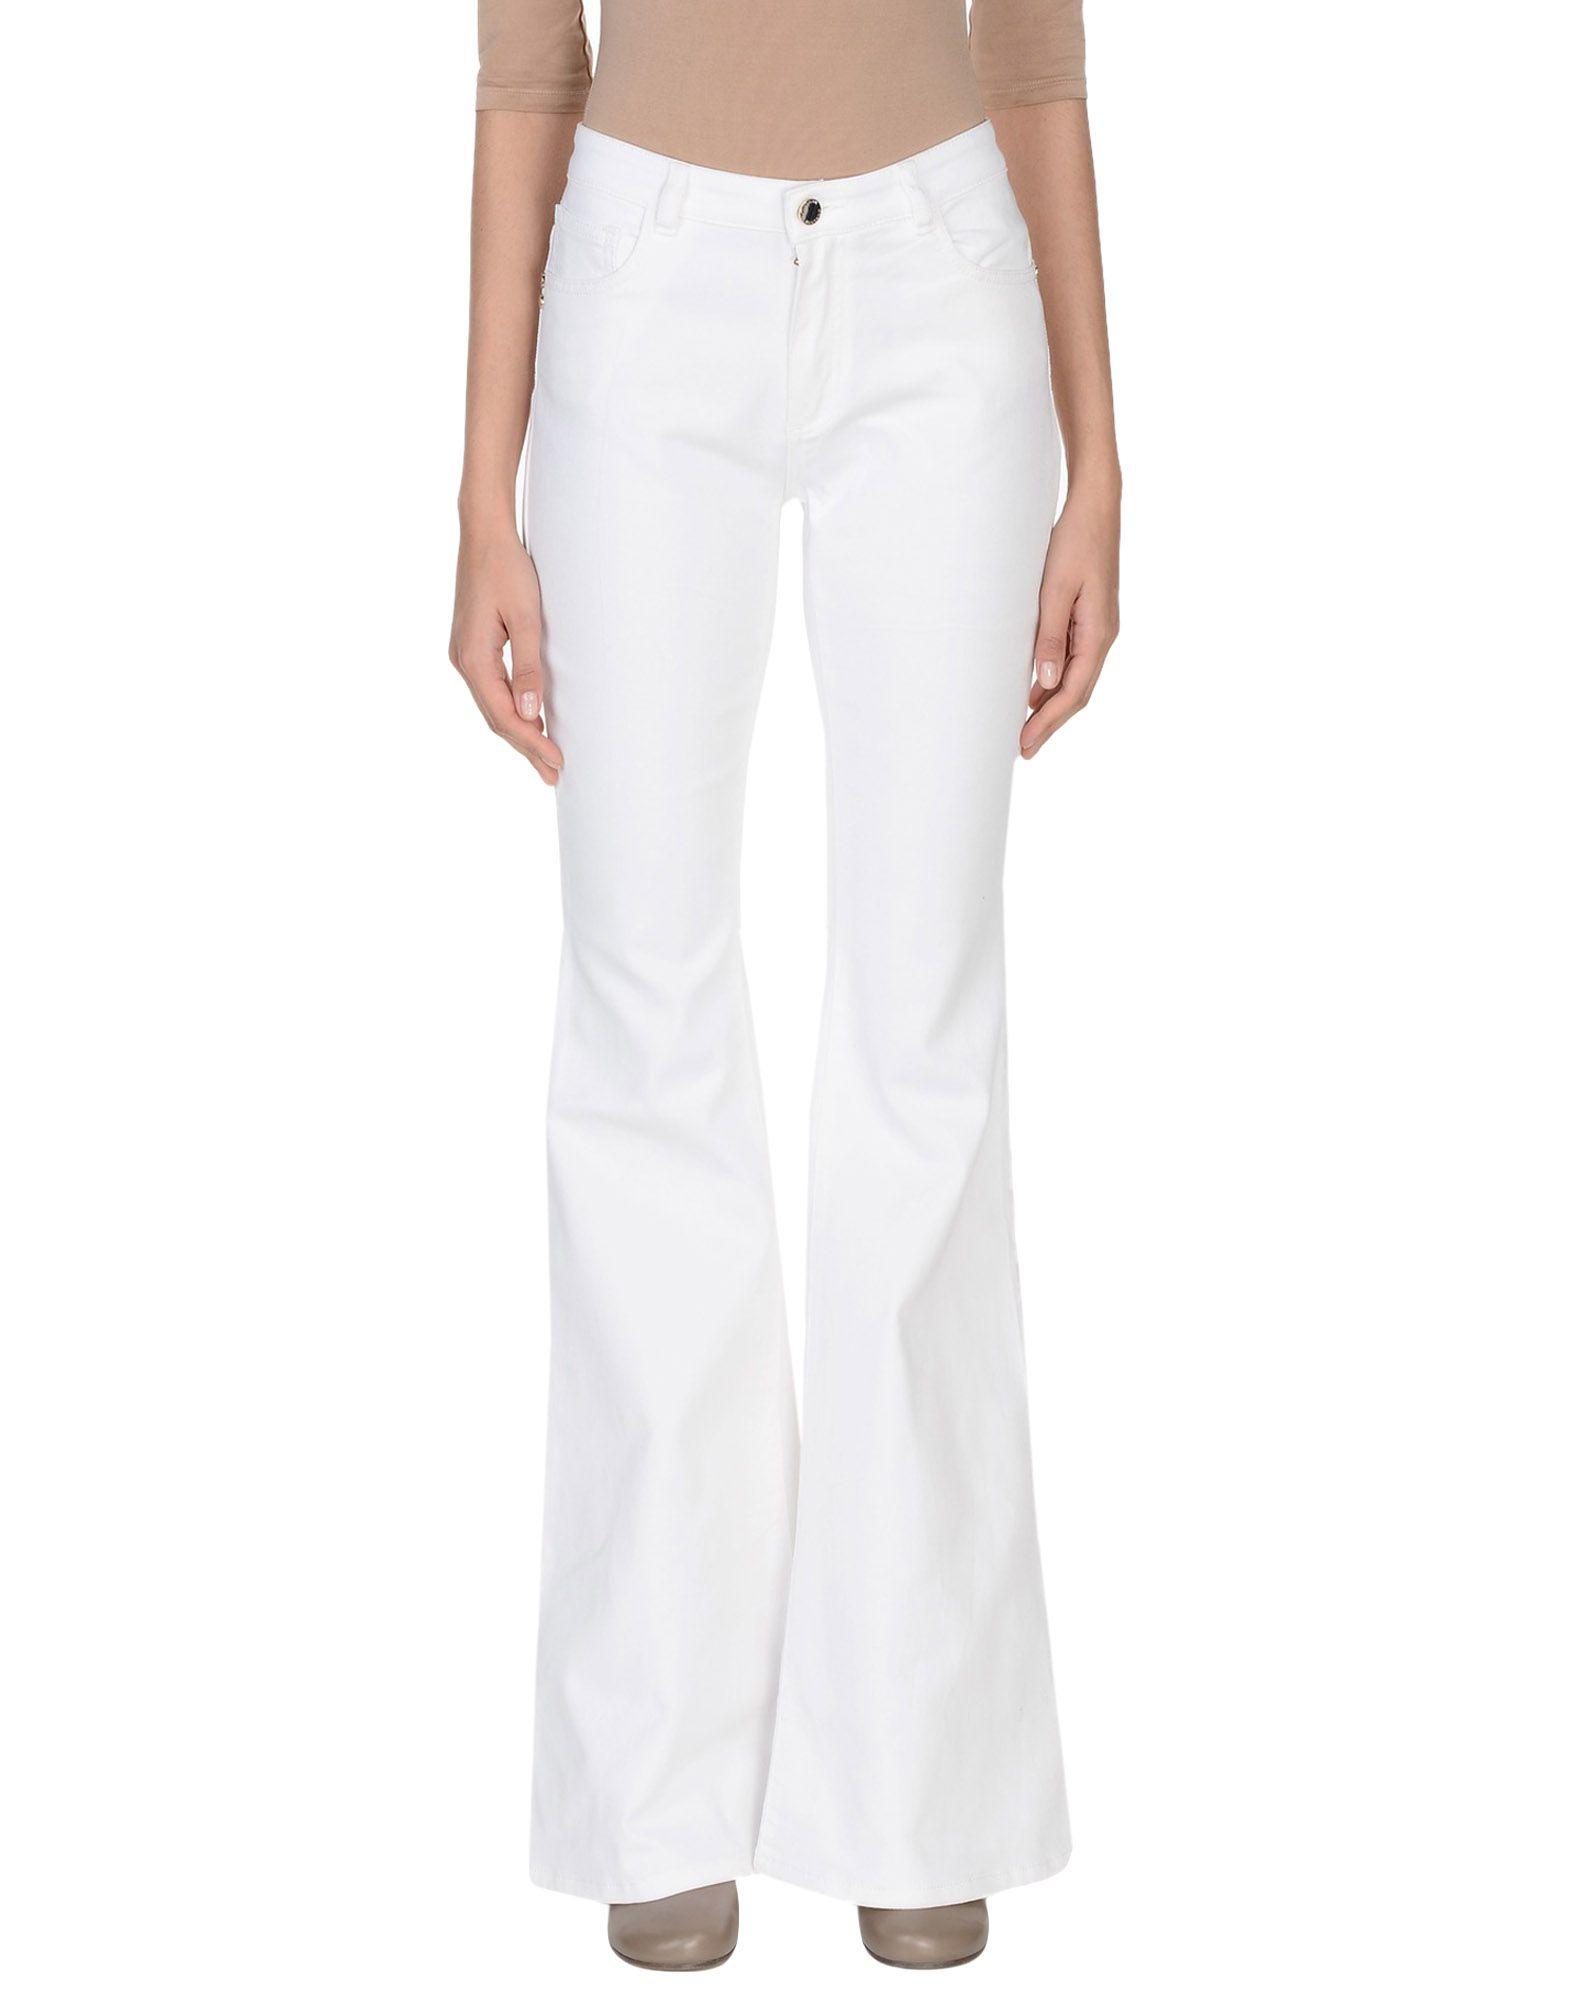 MANGANO Denim Pants in White